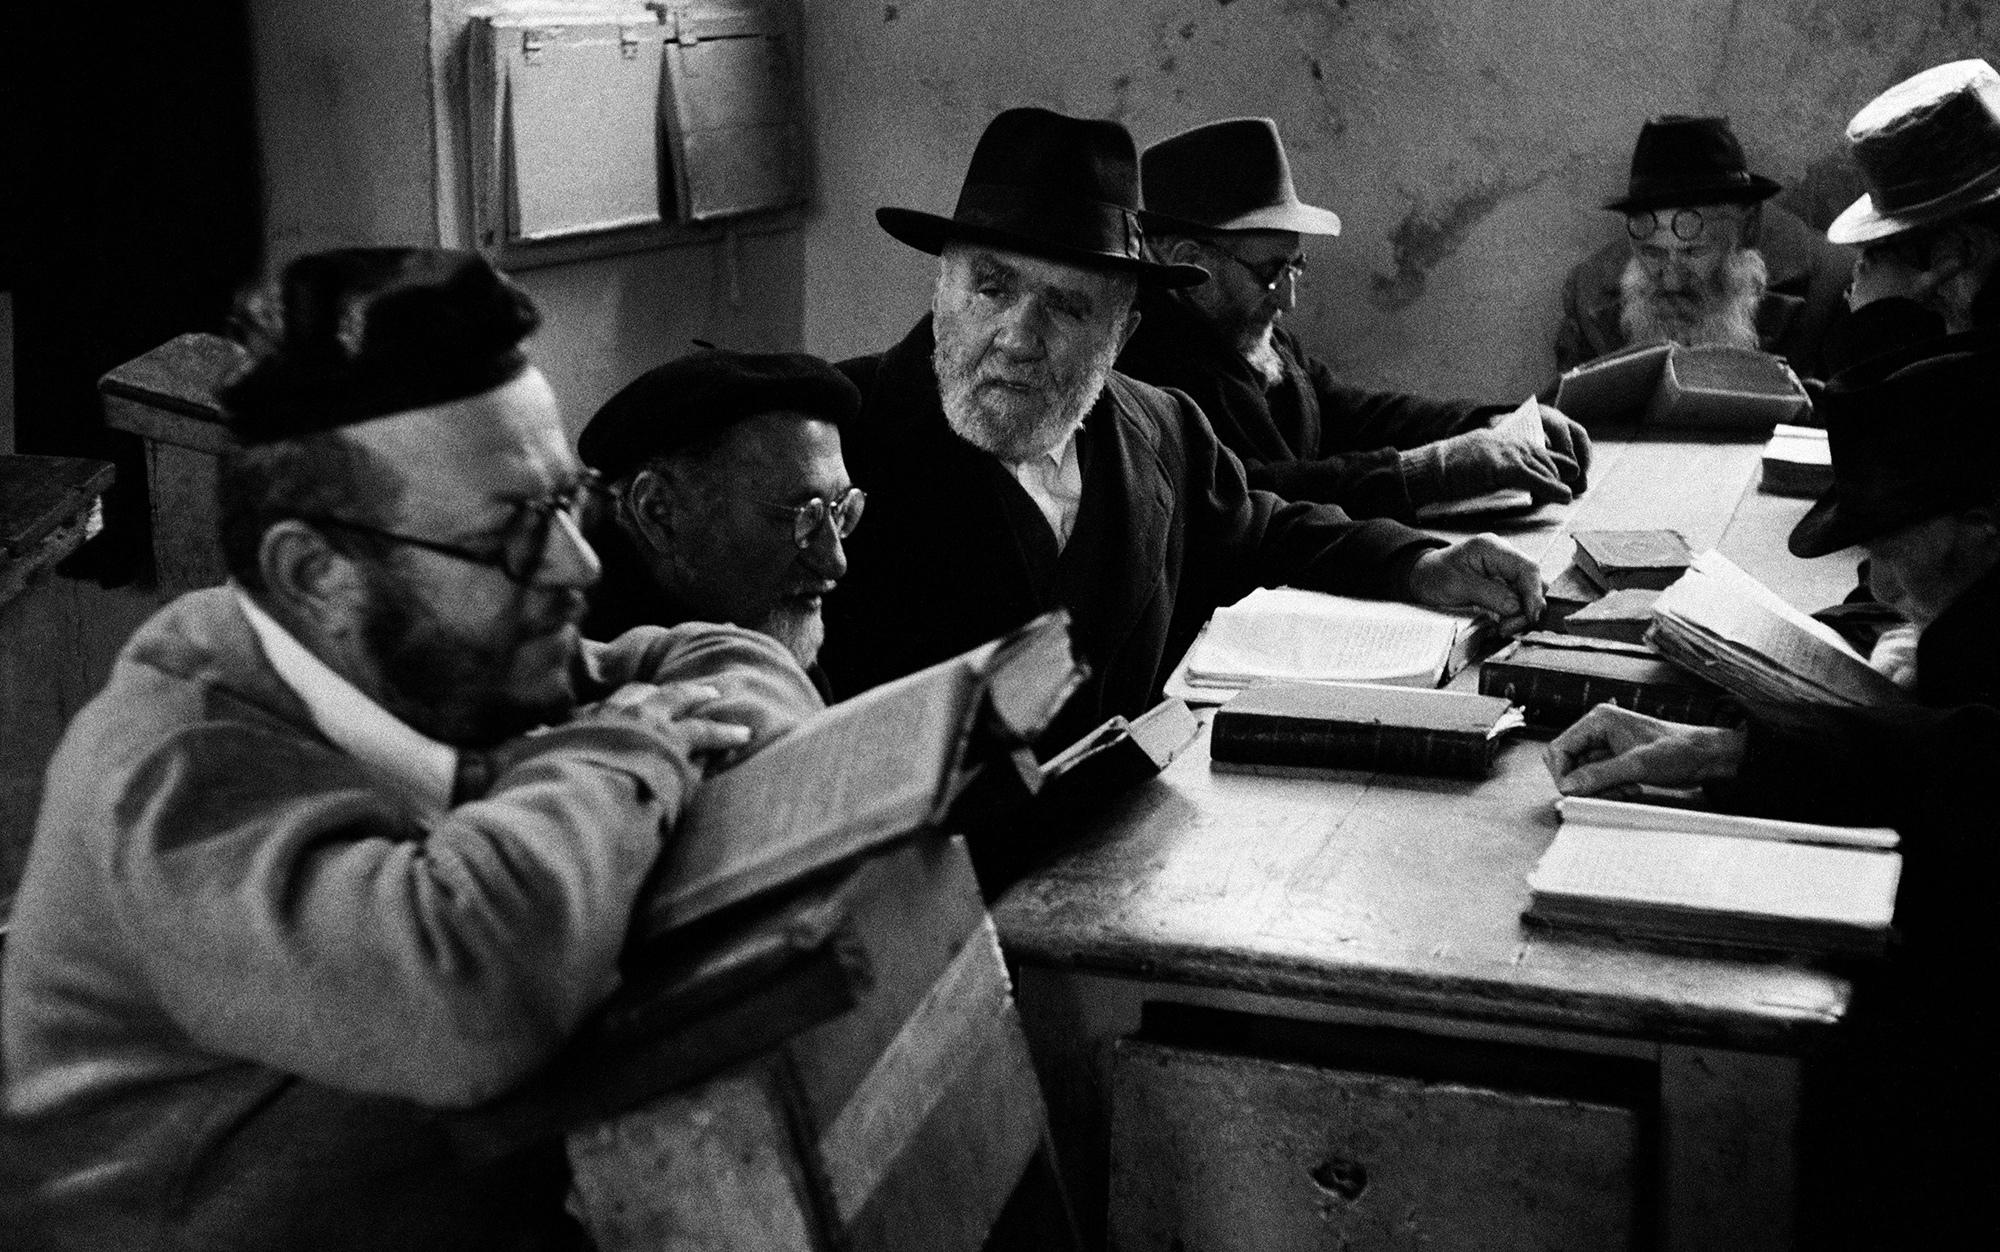 Why the Jewish freethinker Ḥiwi al-Balkhi criticised the Bible – Pieter van der Horst | Aeon Essays